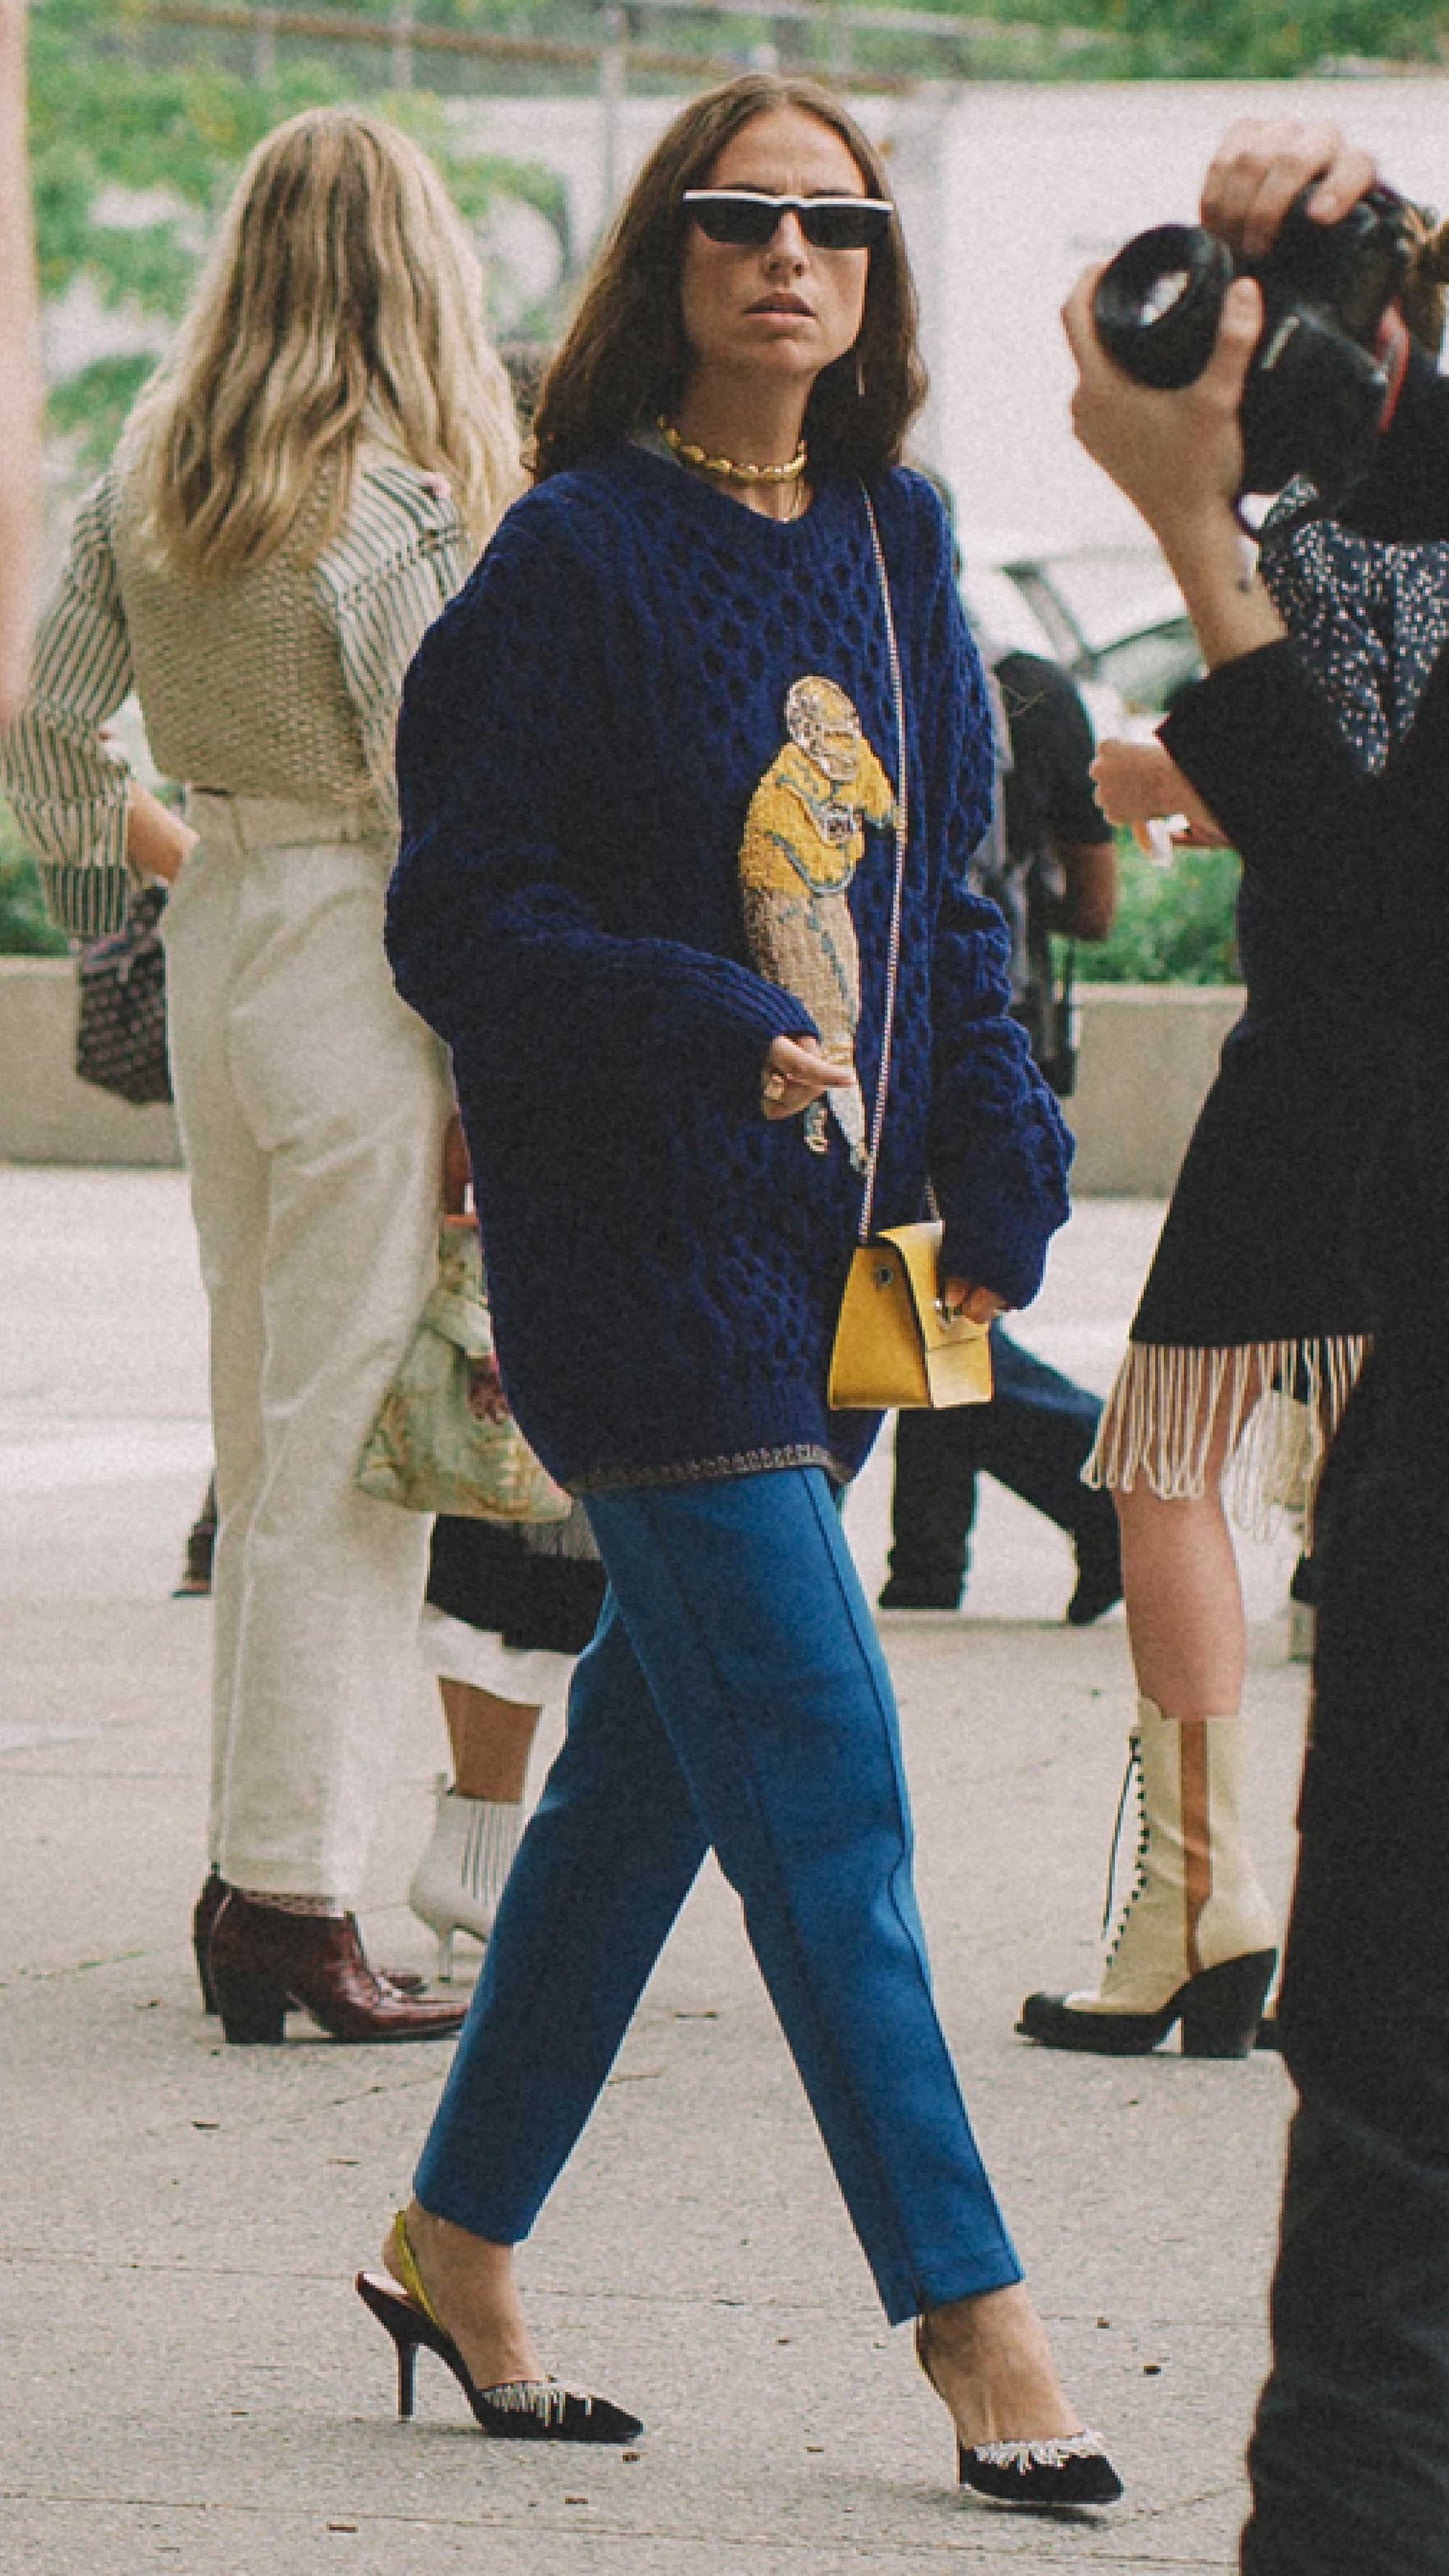 New-York-Fashion-Week-NYFW-SS18-street-style-day-five-SS18-22.jpg